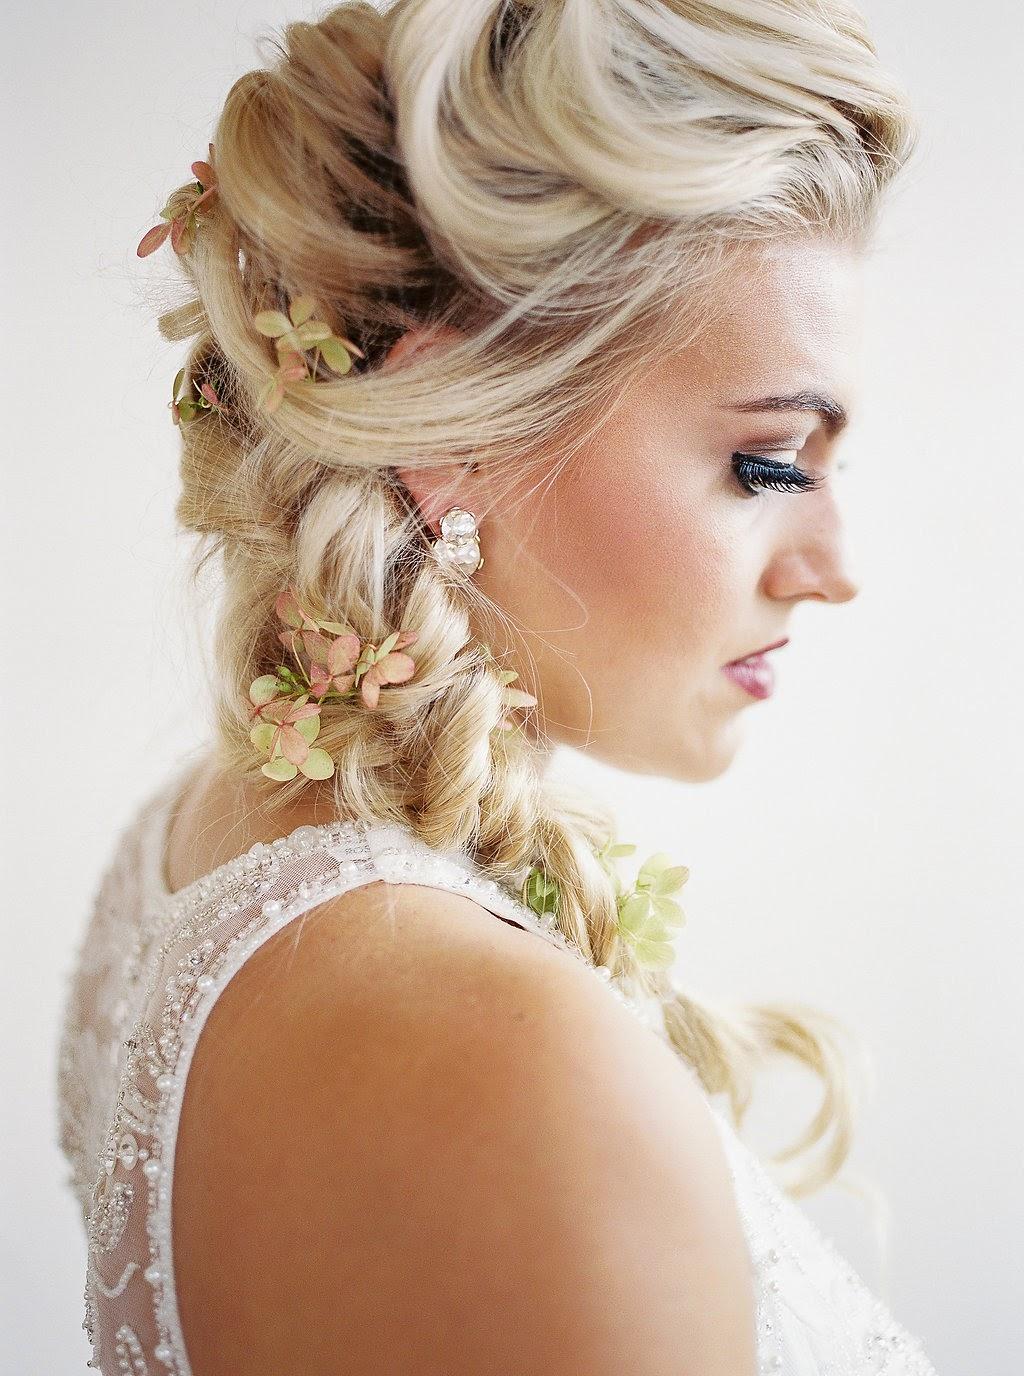 Alexandra-Elise-Photography-Ali-Reed-Film-Wedding-Photographer-204.jpg